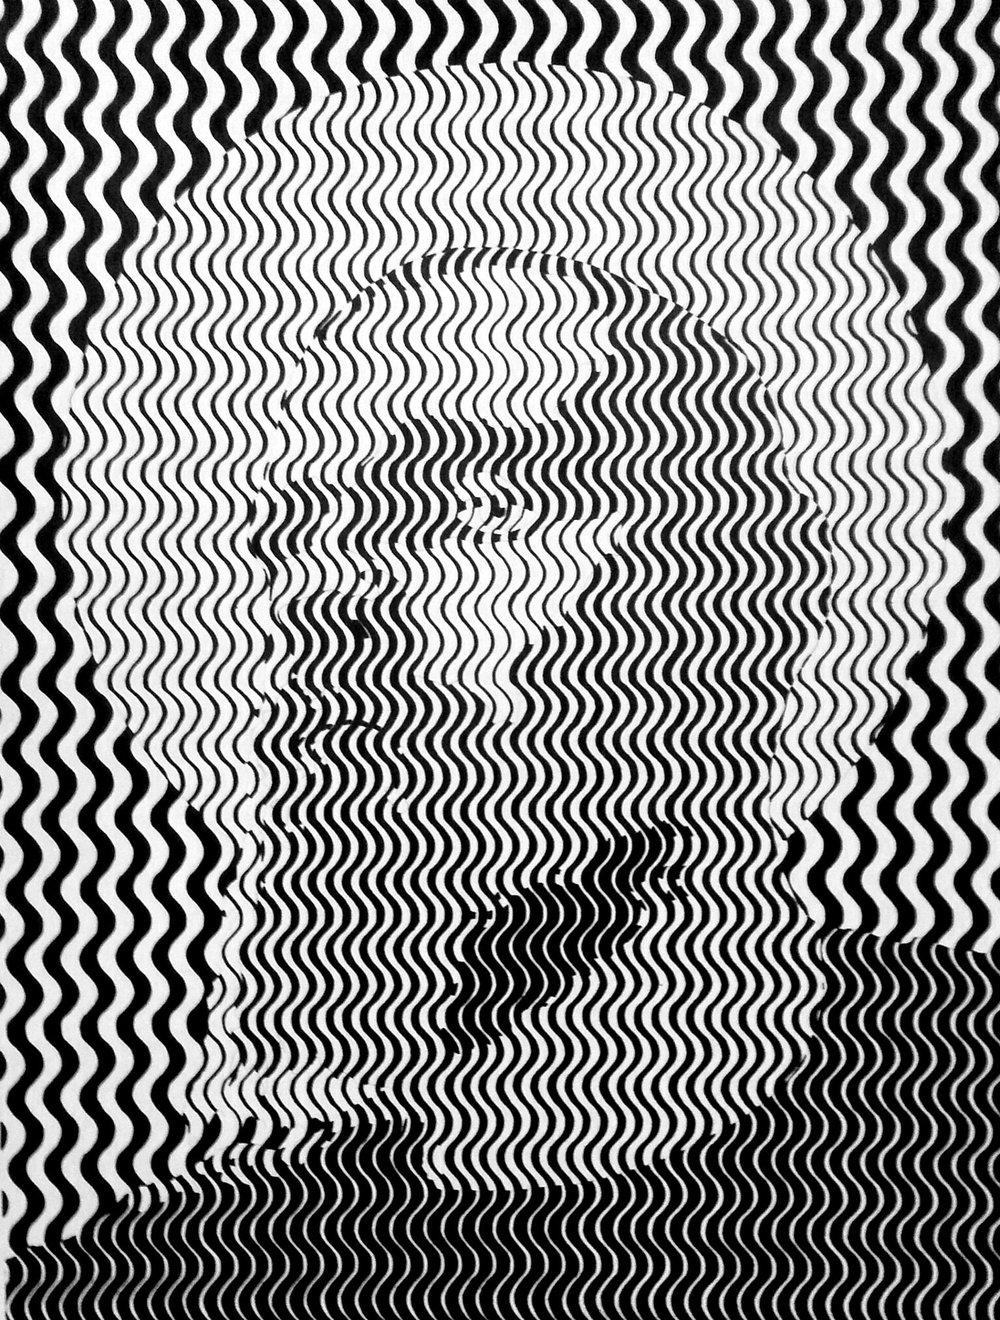 Cory Slawson - Tempe